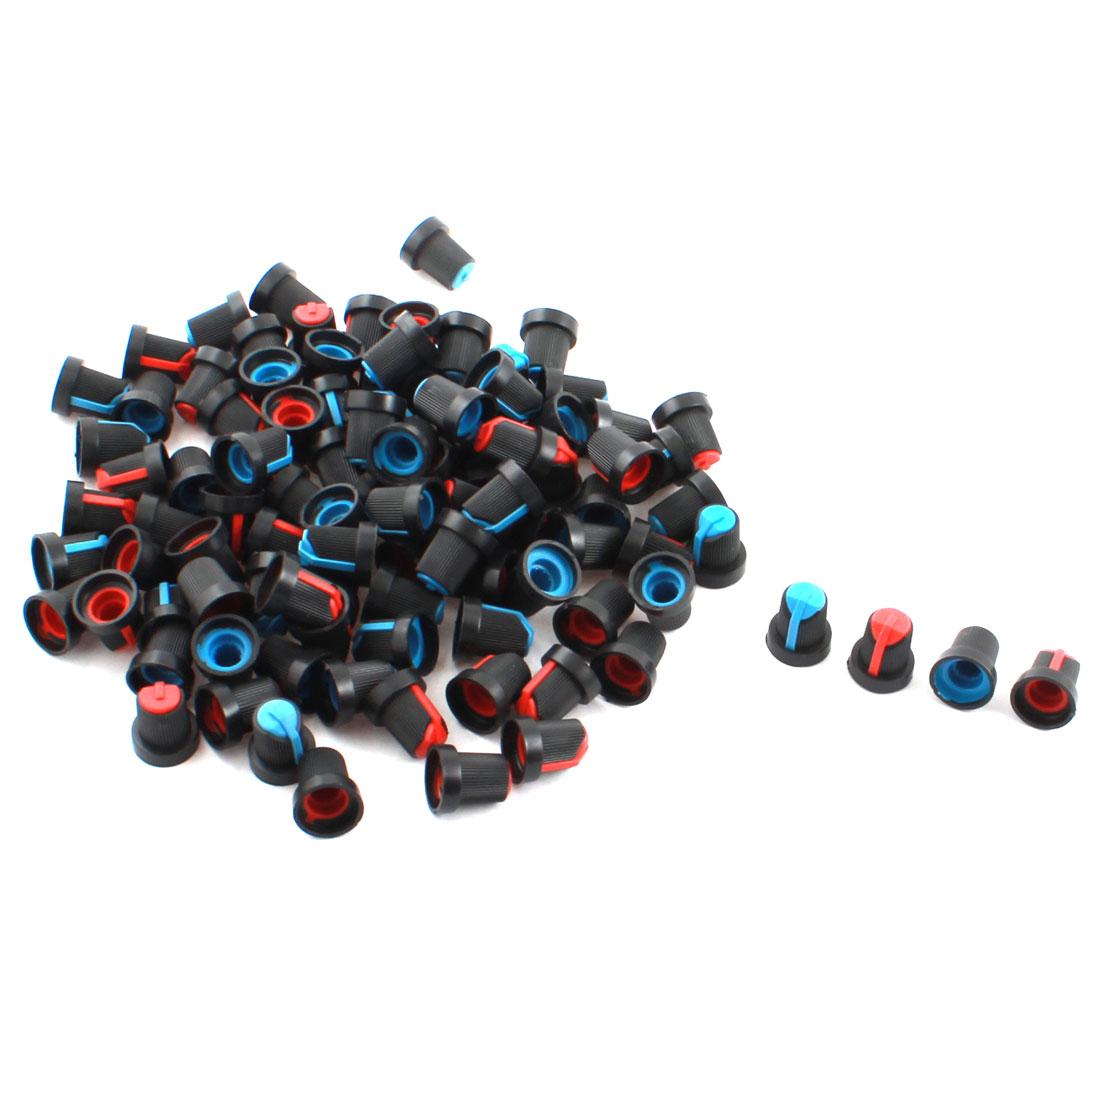 100 Pcs Black Blue Red Plastic 5.5mm Hole Rotary Taper Potentiometer Pot